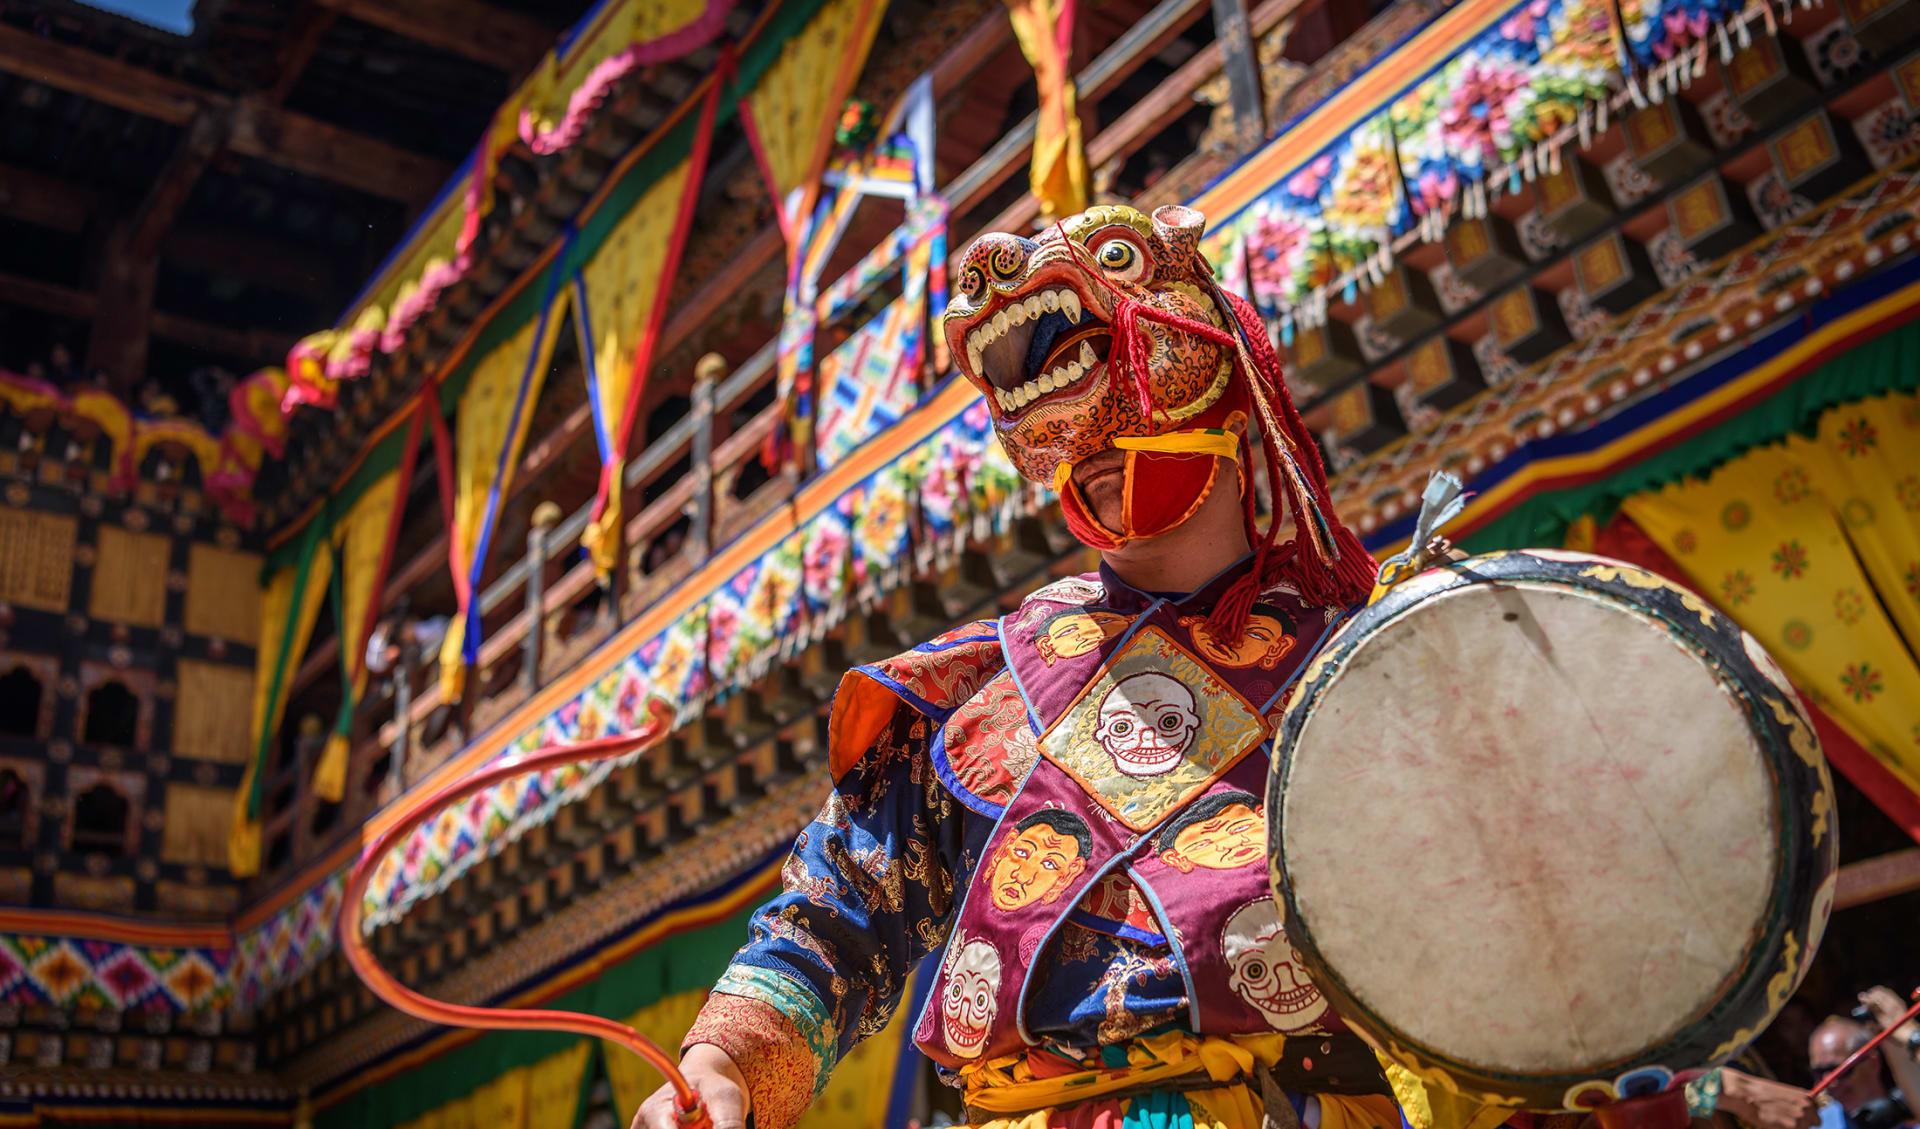 Kloster, Bhutan